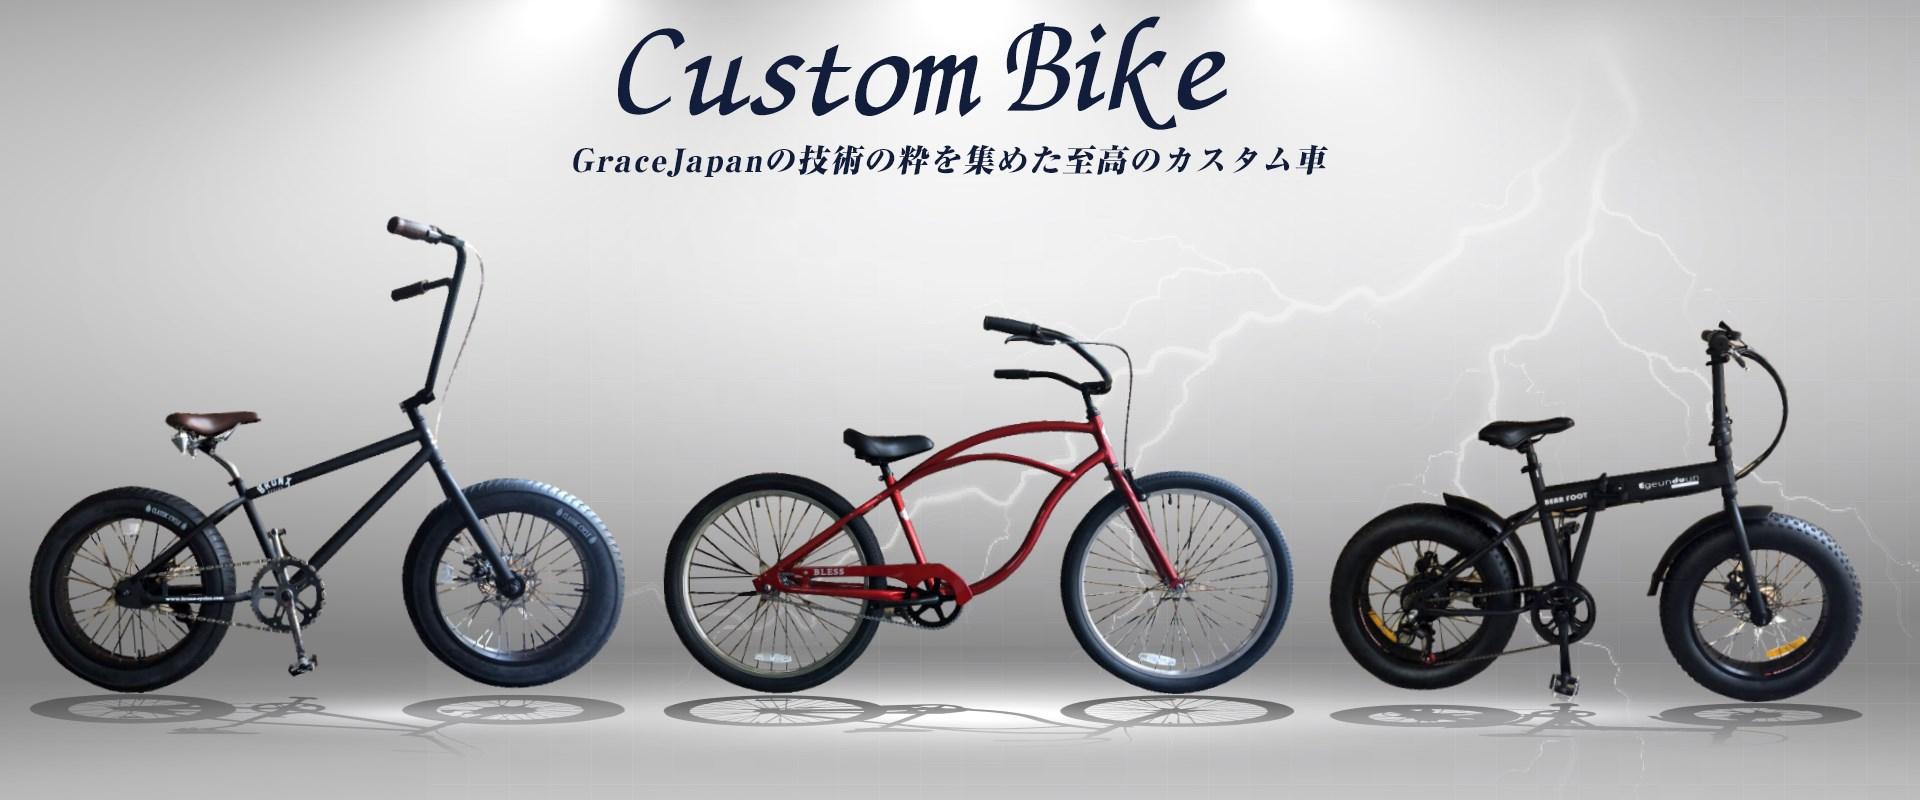 CustomBikeGraceJapanの技術の粋を集めた至高のカスタム車